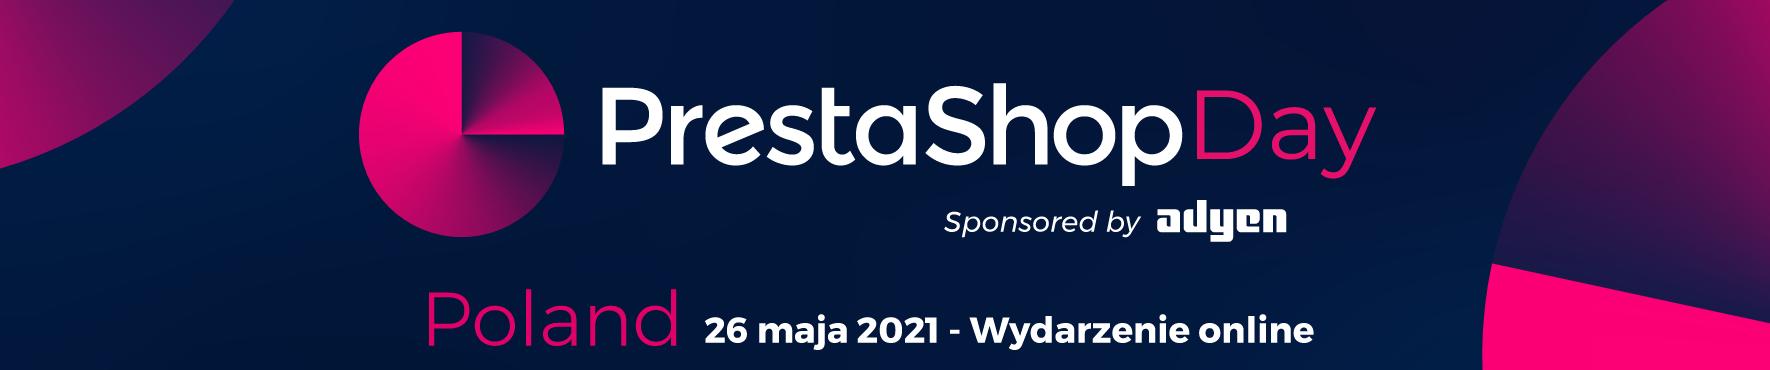 PrestaShopDay Poland -